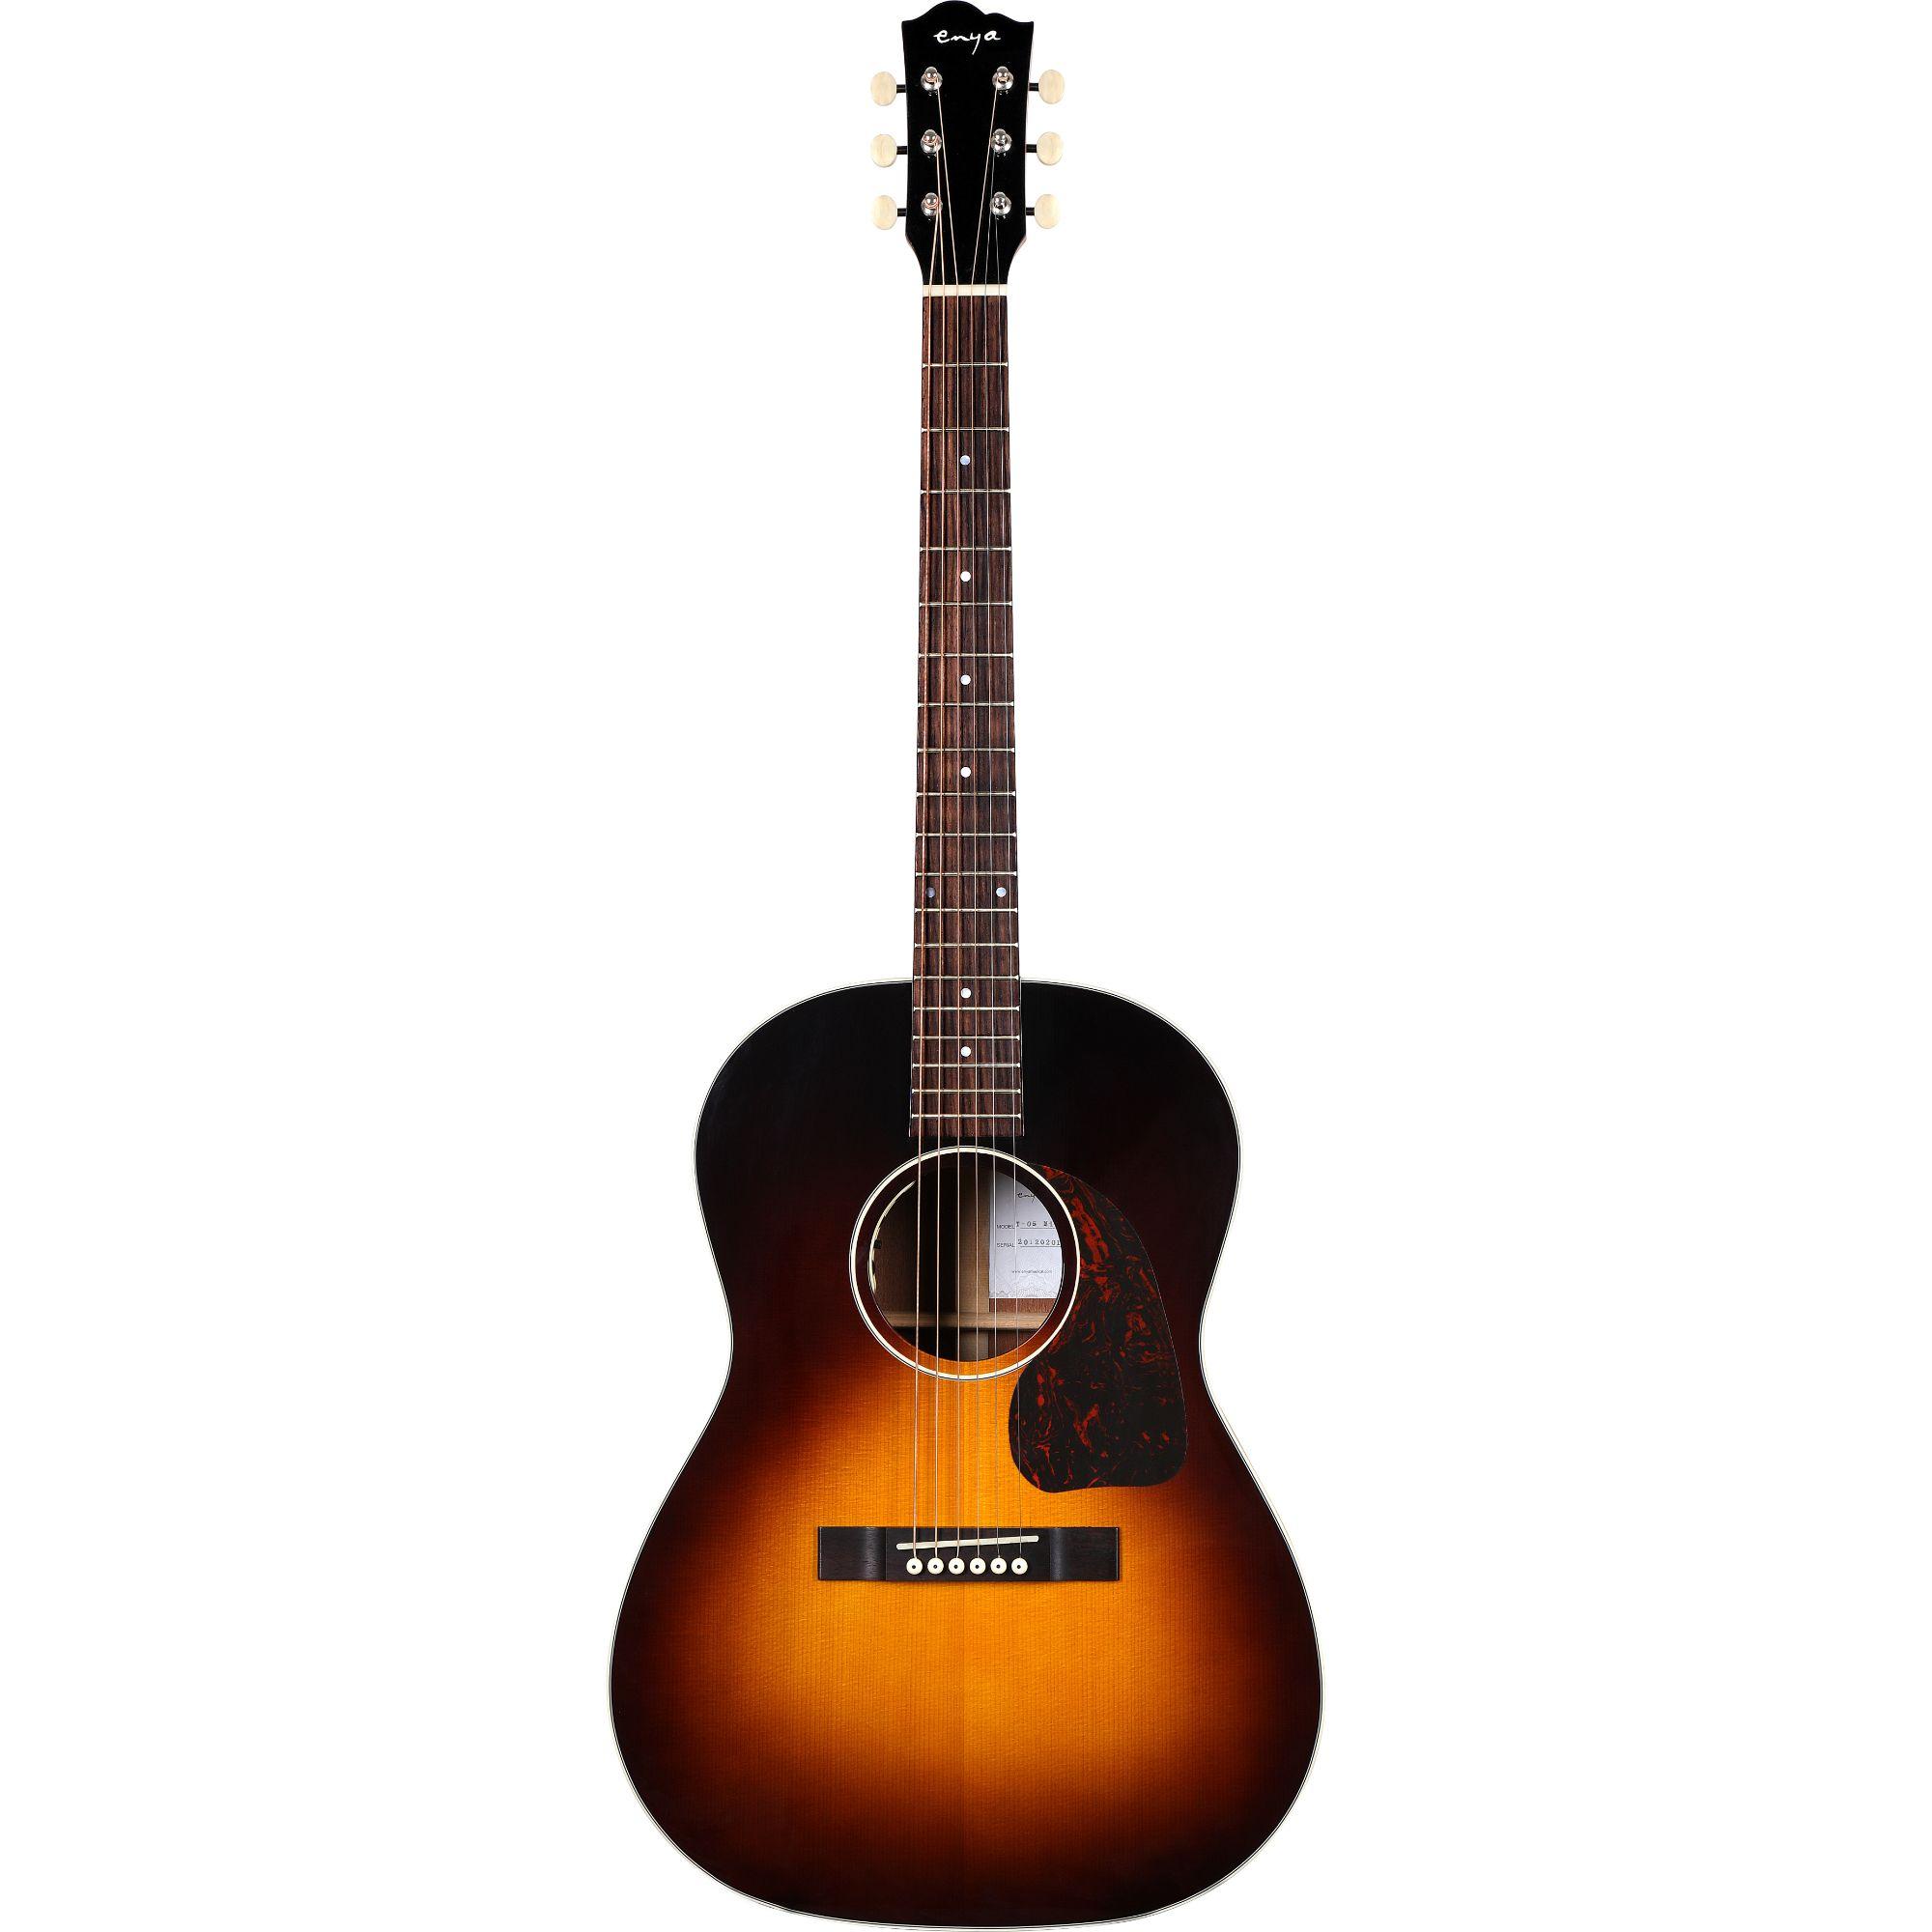 Enya T05B  Semi- Acoustic Guitar-  Sunburst  with Hardcase | vintage series